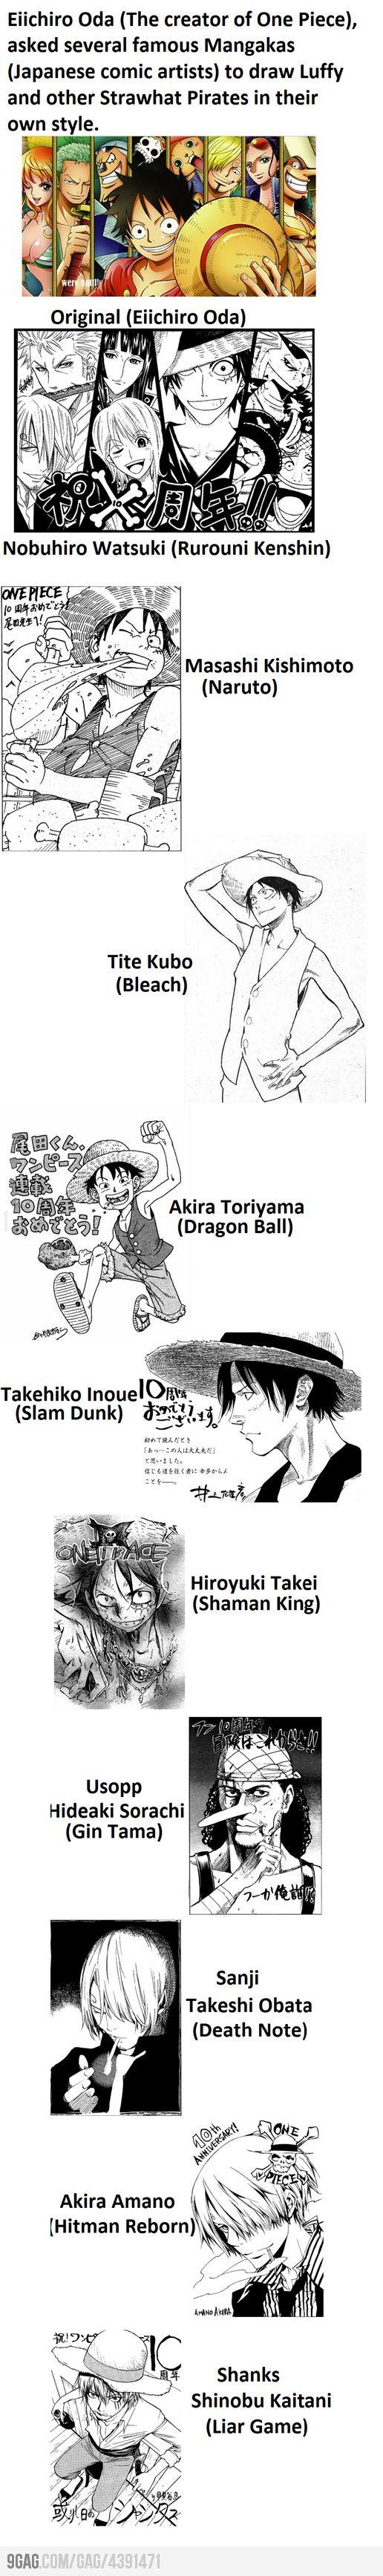 I like Obata's rendition of Sanji.